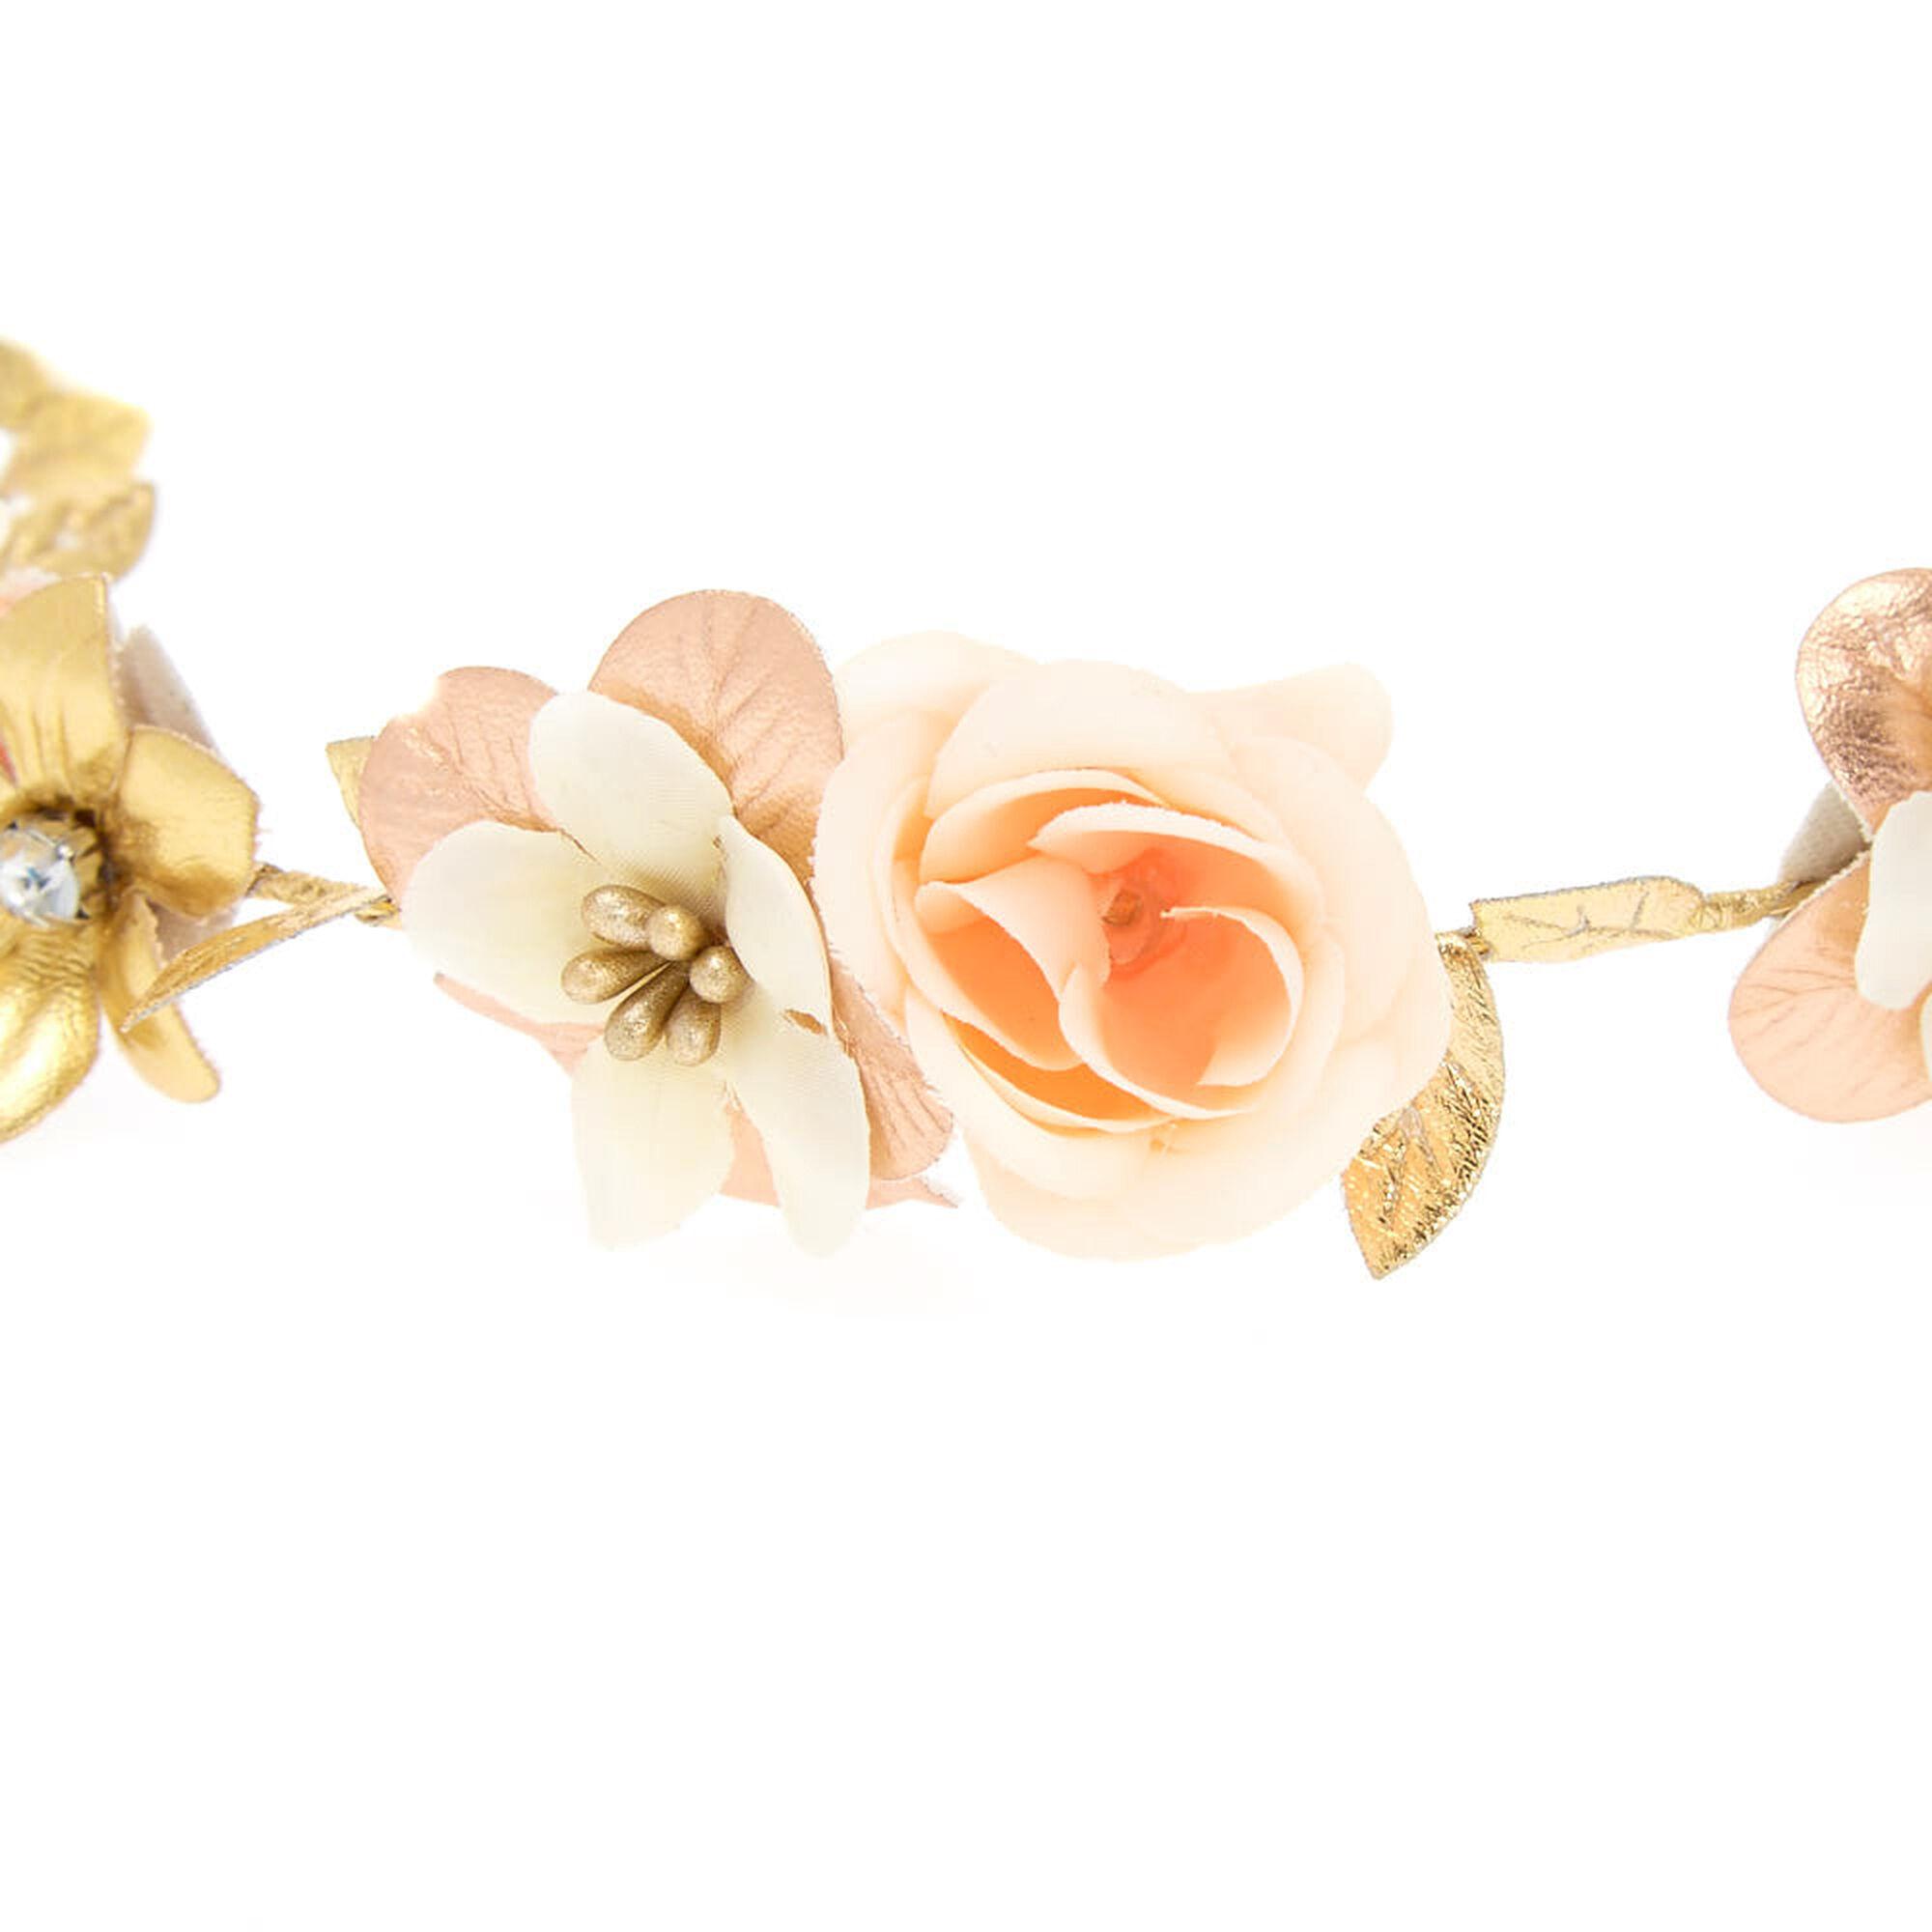 Rose gold flower crown tie headwrap icing us rose gold flower crown tie headwrap izmirmasajfo